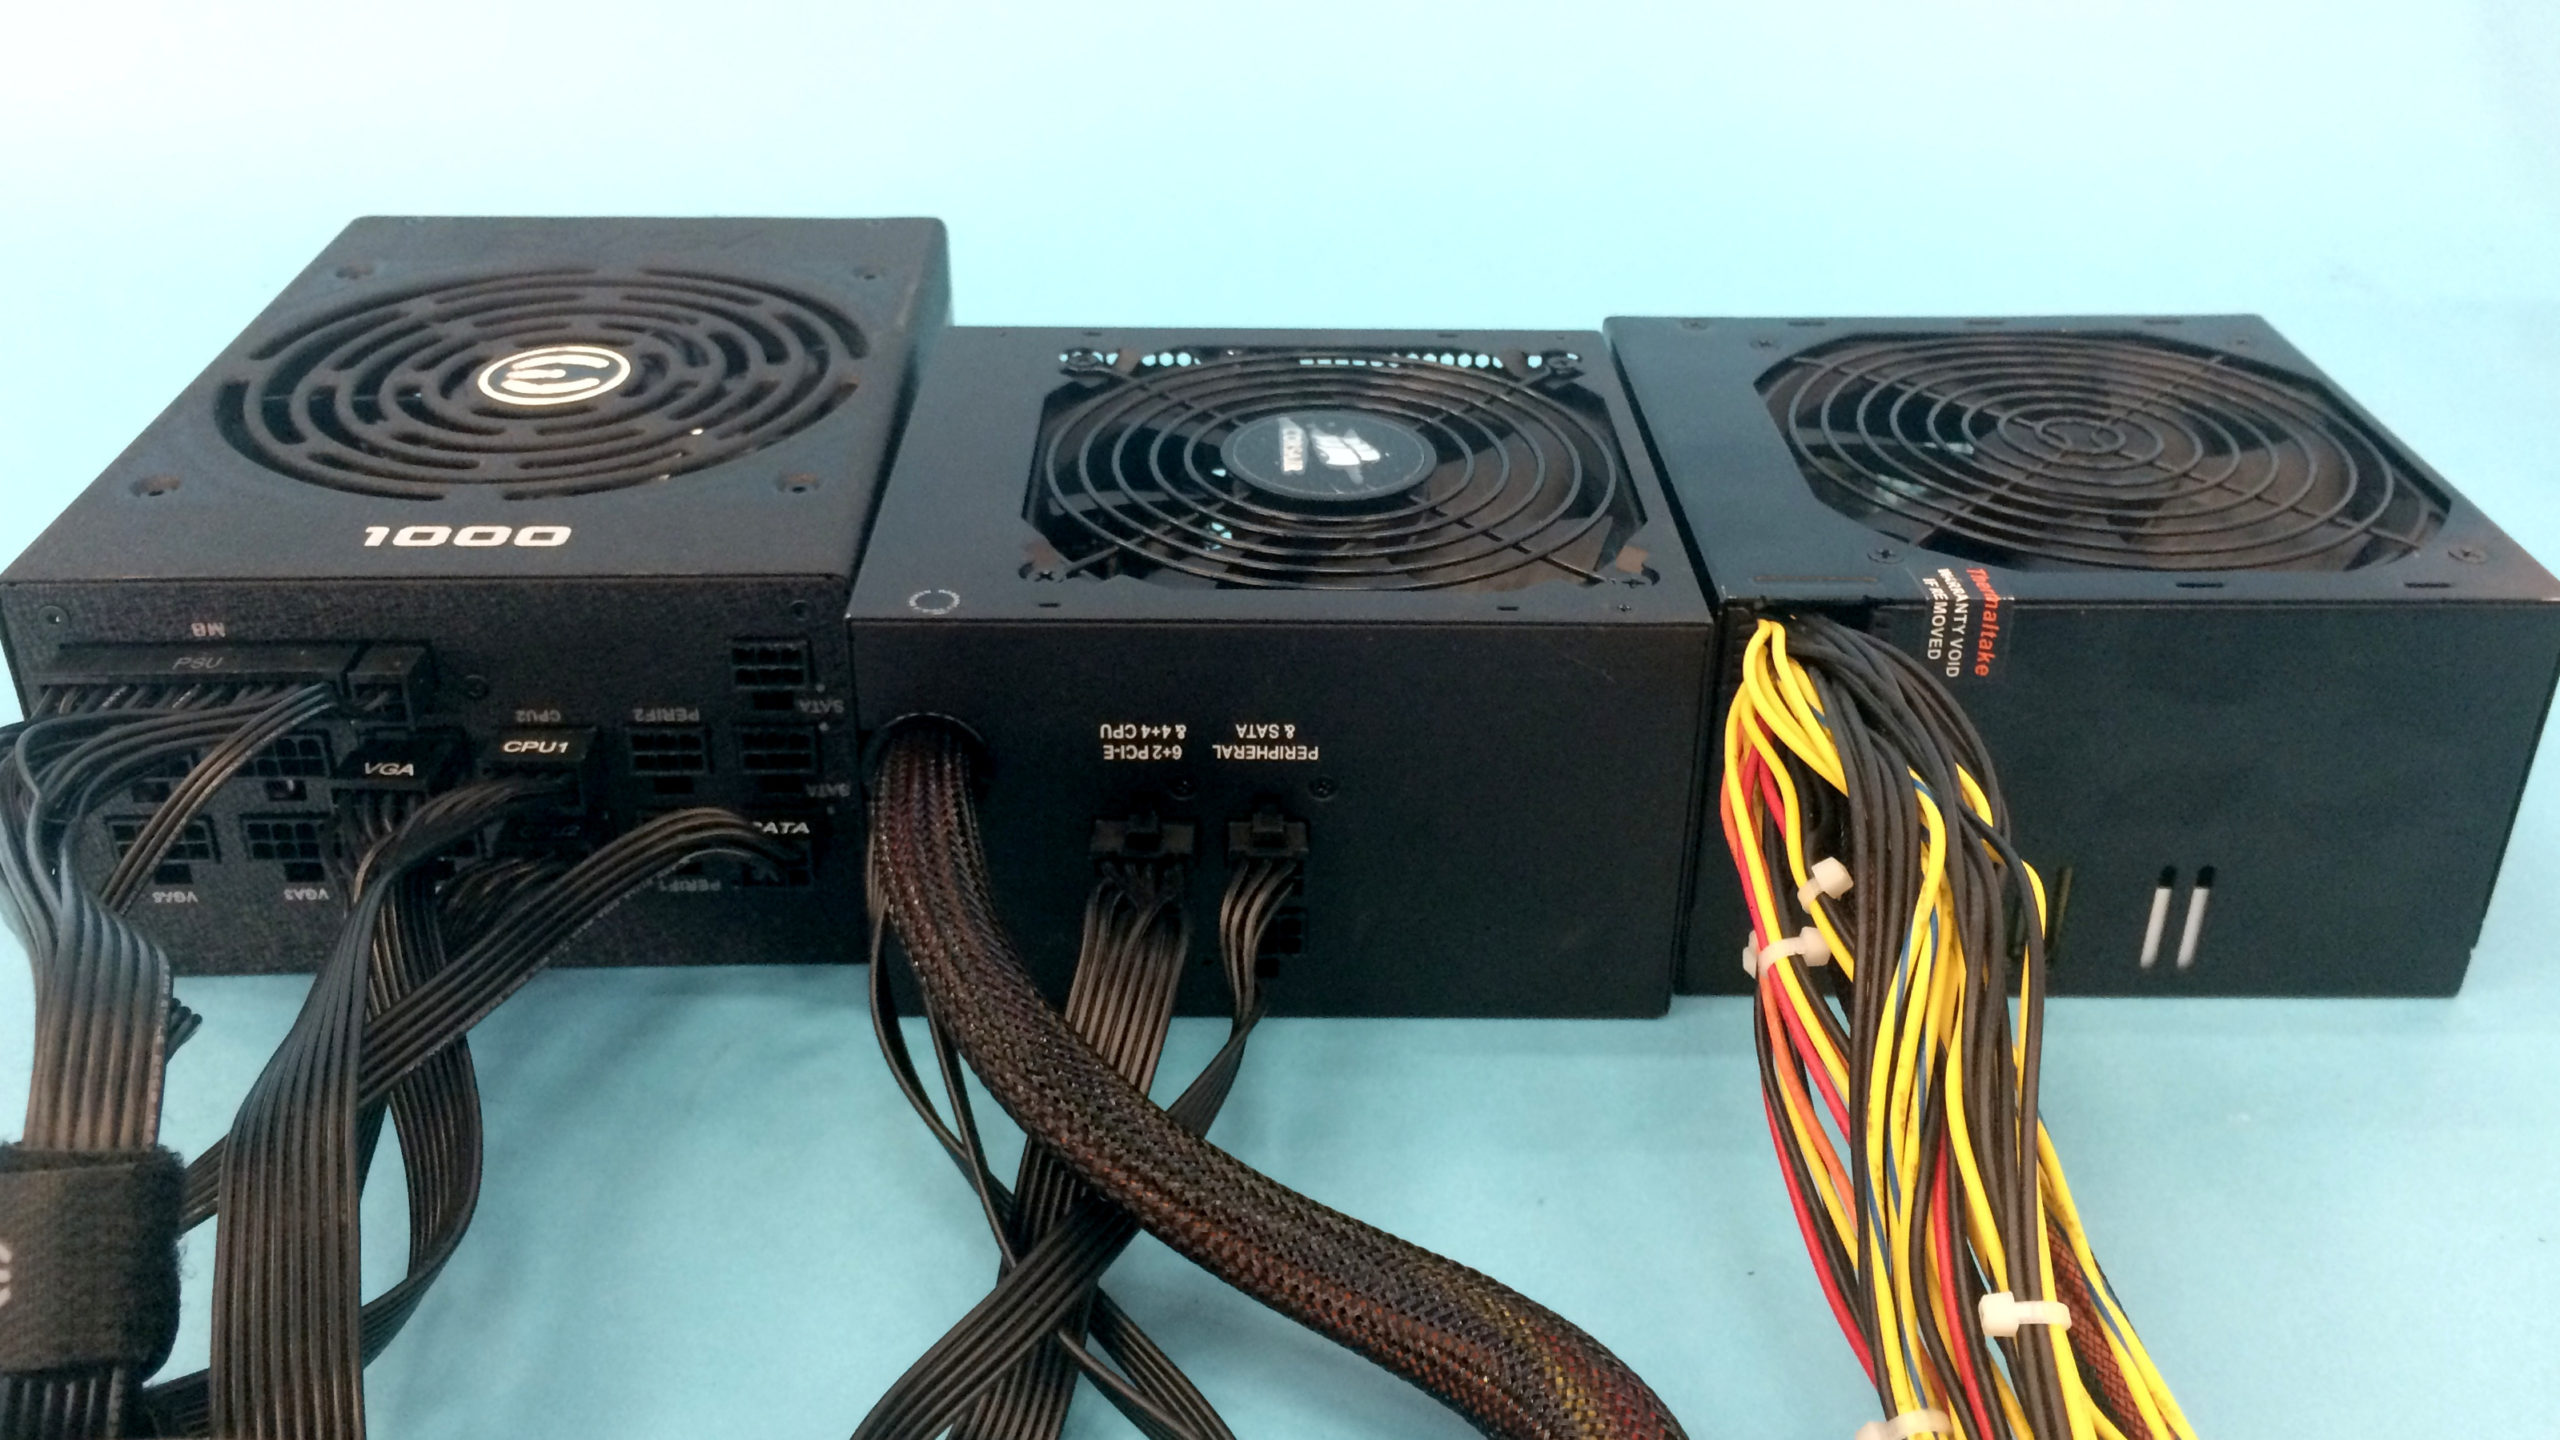 choosing a PC power supply